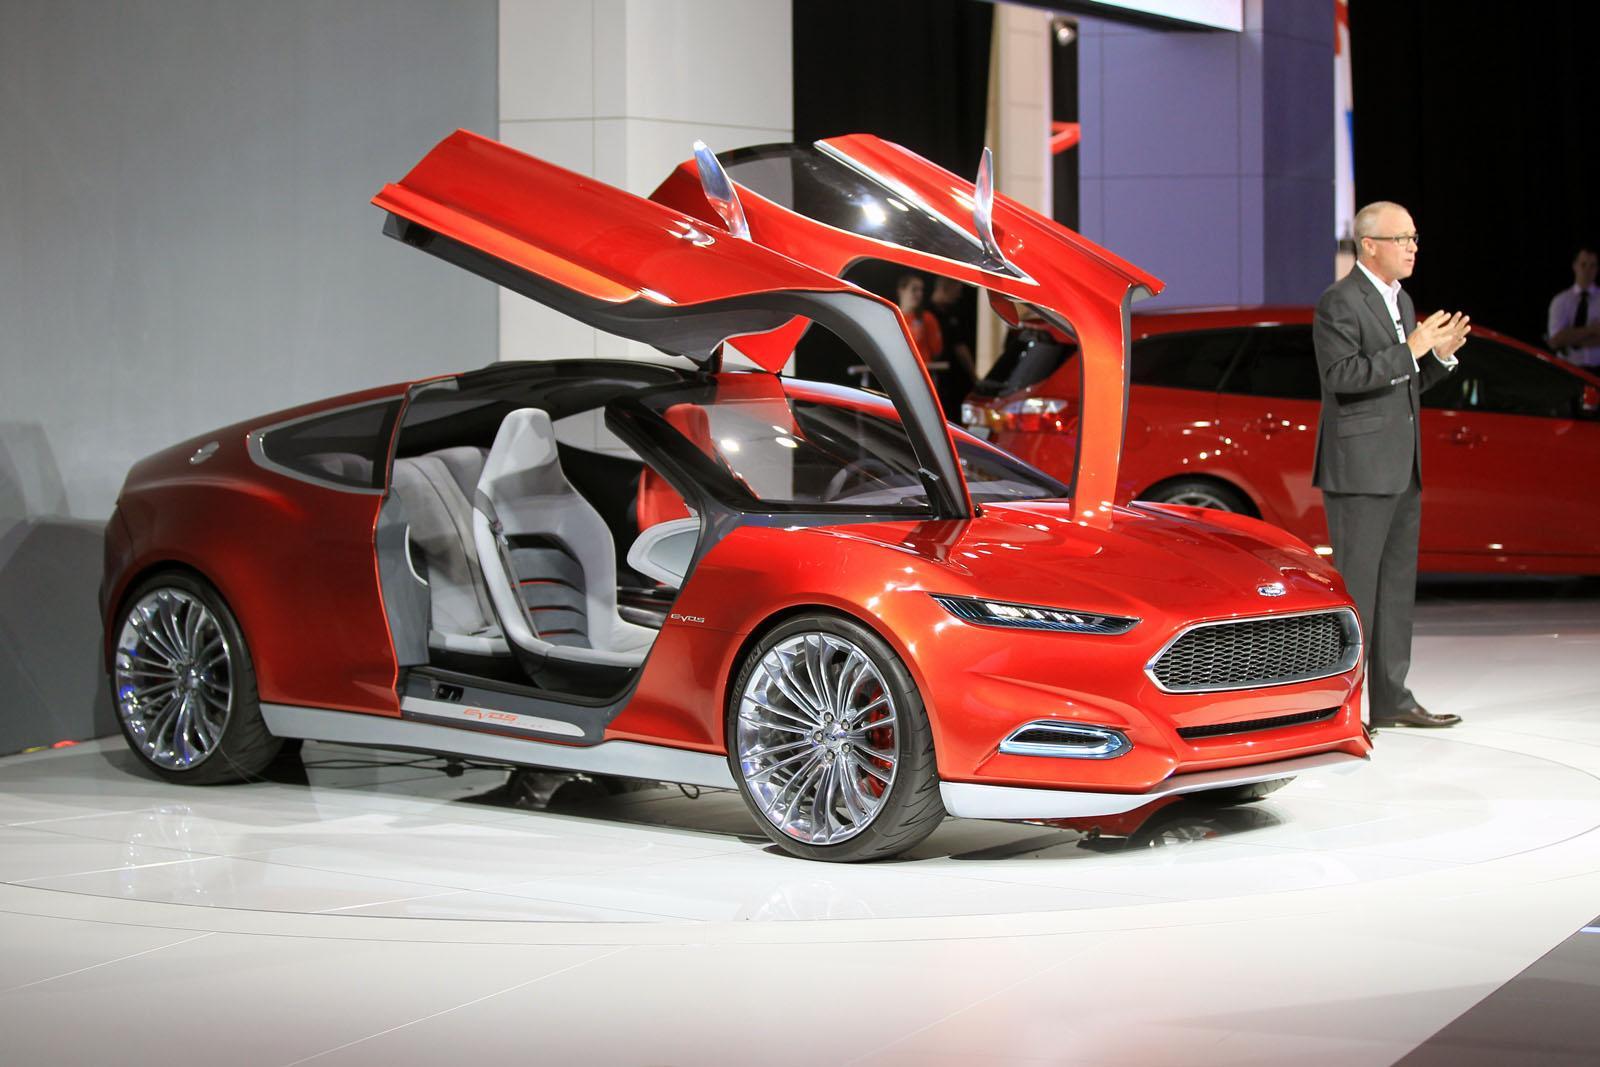 latest cars models ford mustang 2014. Black Bedroom Furniture Sets. Home Design Ideas